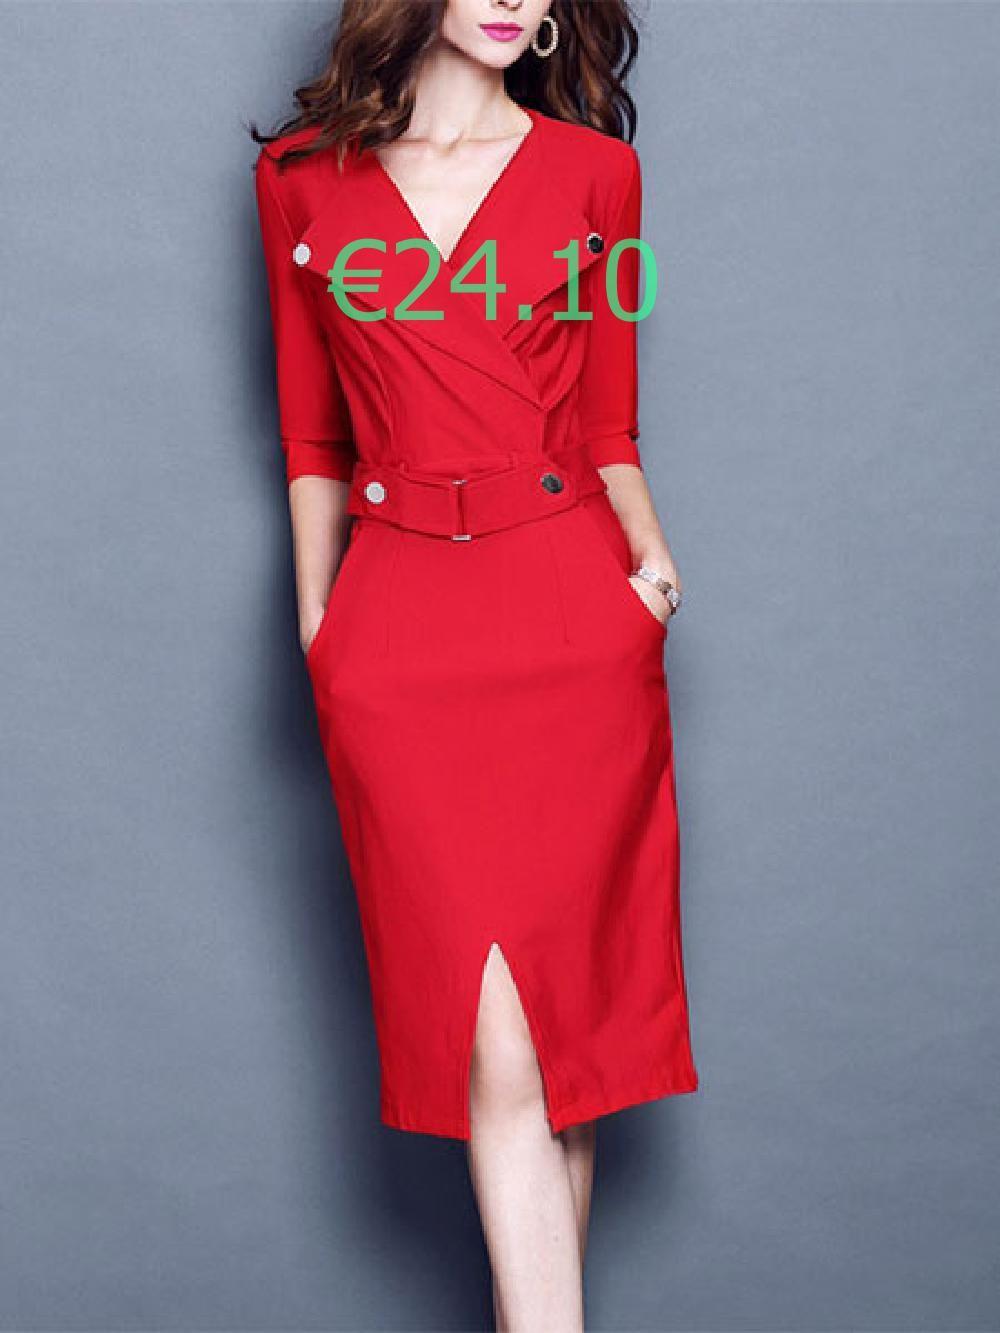 roten figurbetonten kleid halbarm damen slim fit elegantes